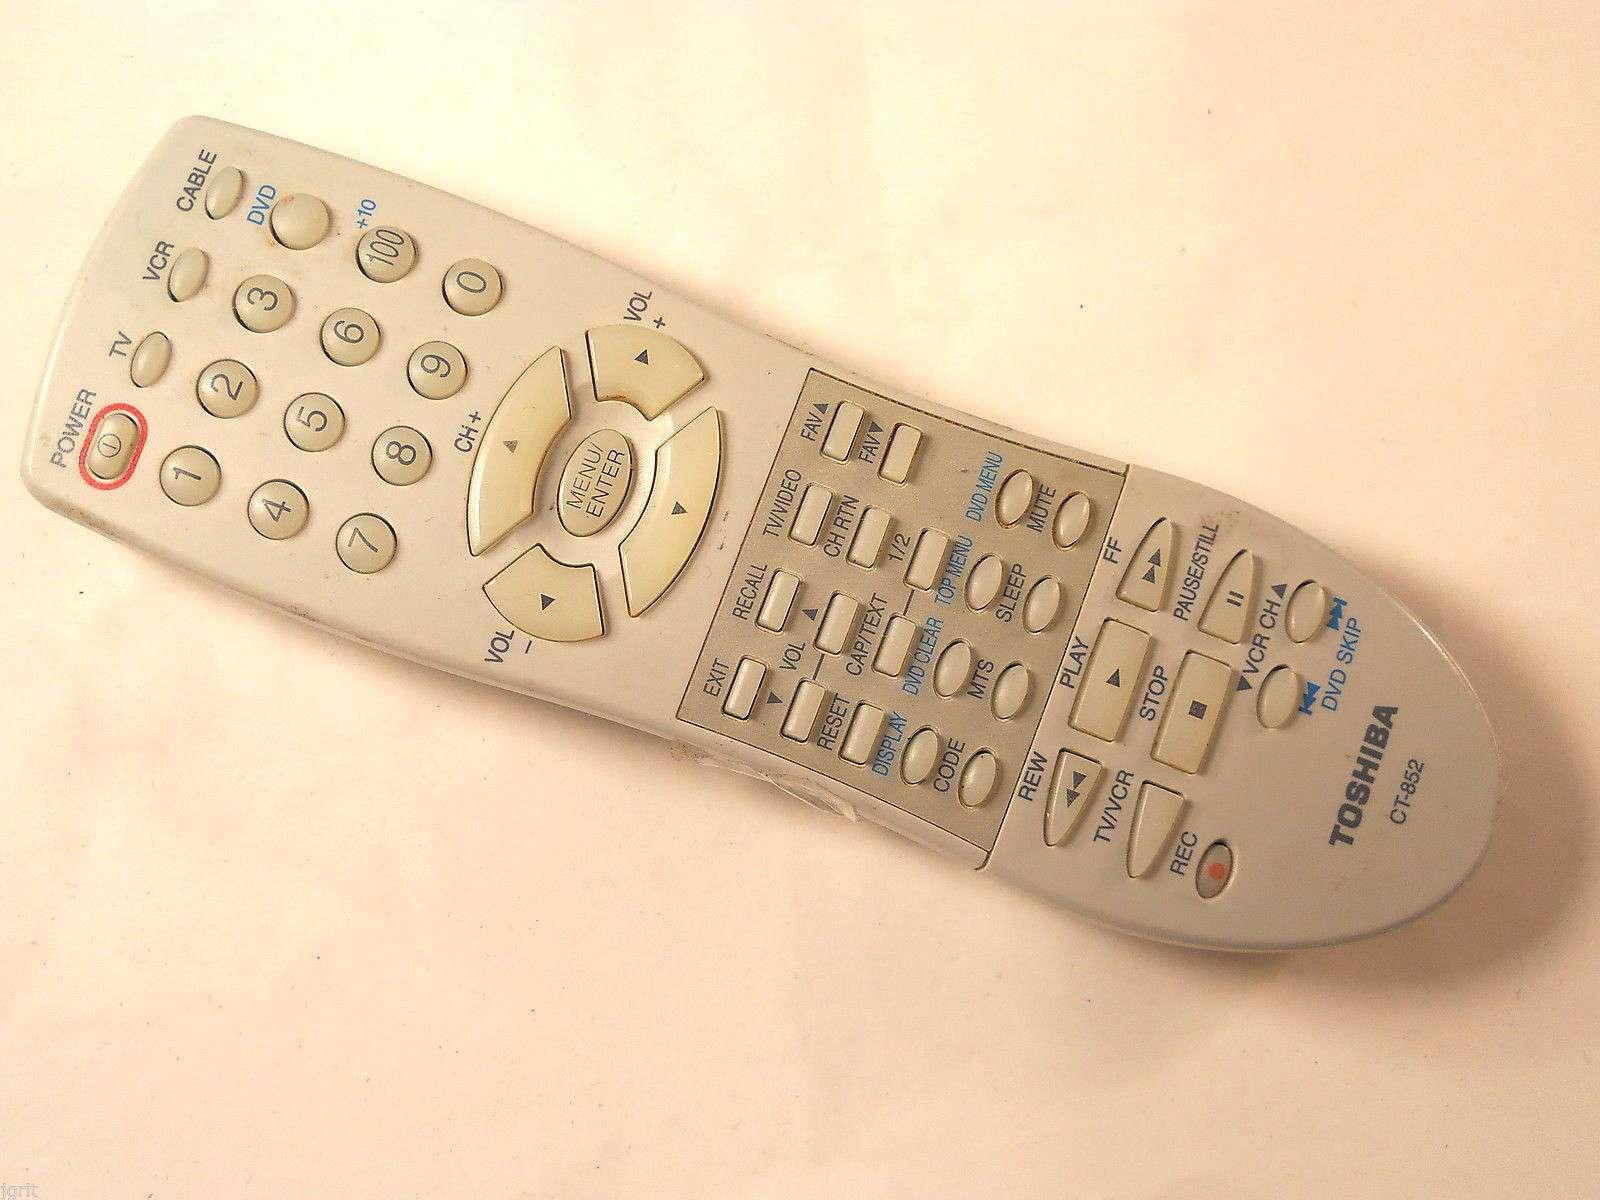 TOSHIBA CT-852 Remote Control 27A43 27A43C 27A44 27A45 27A45C 27A46 TV VCR  ct852